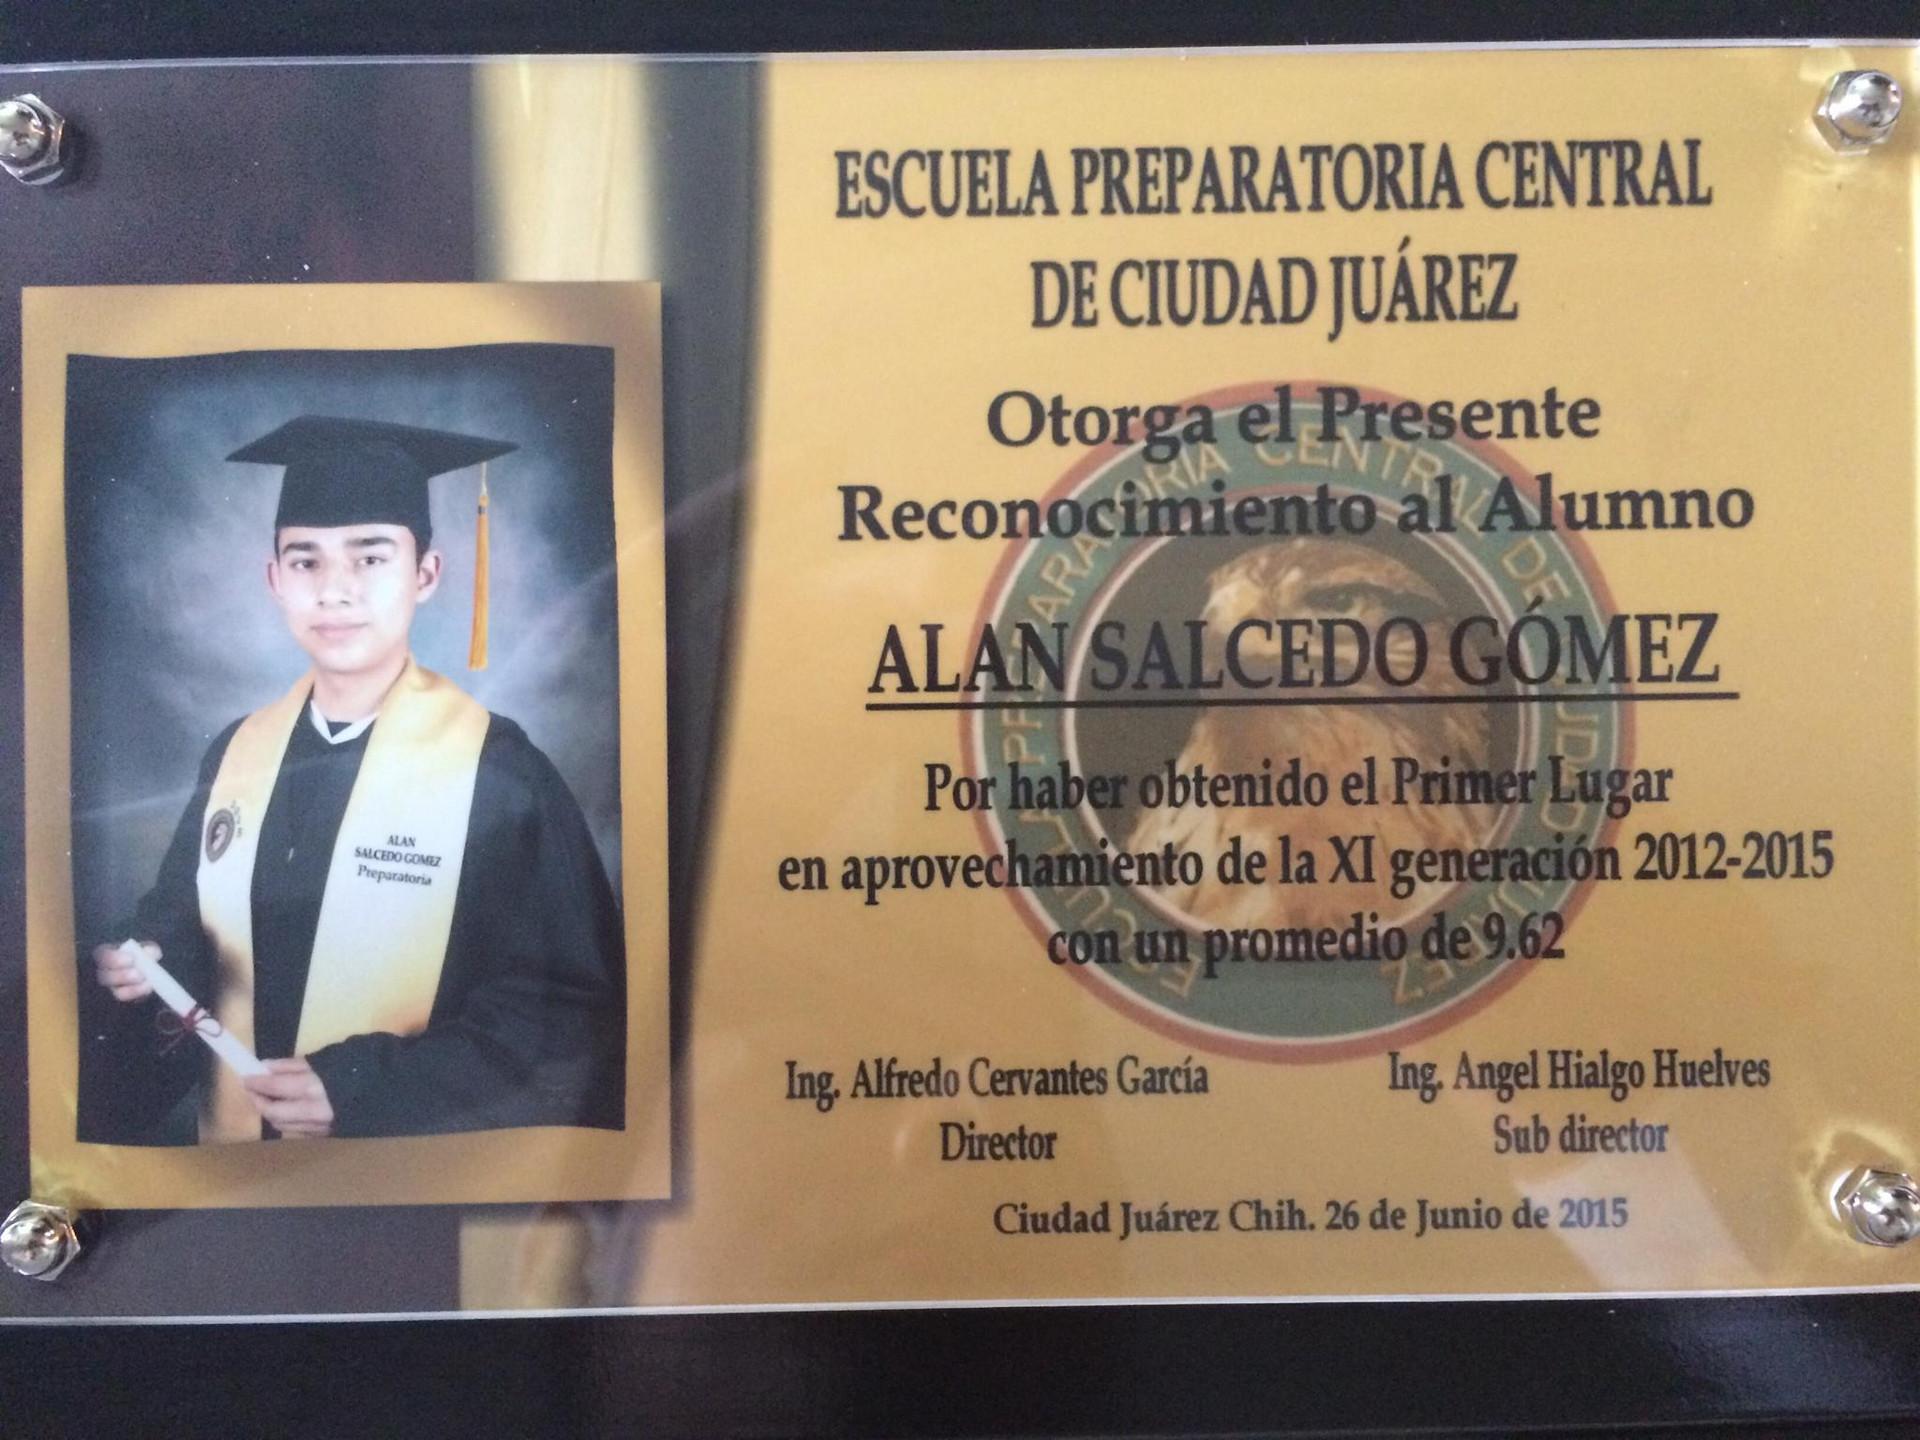 High School Valedictorian Award